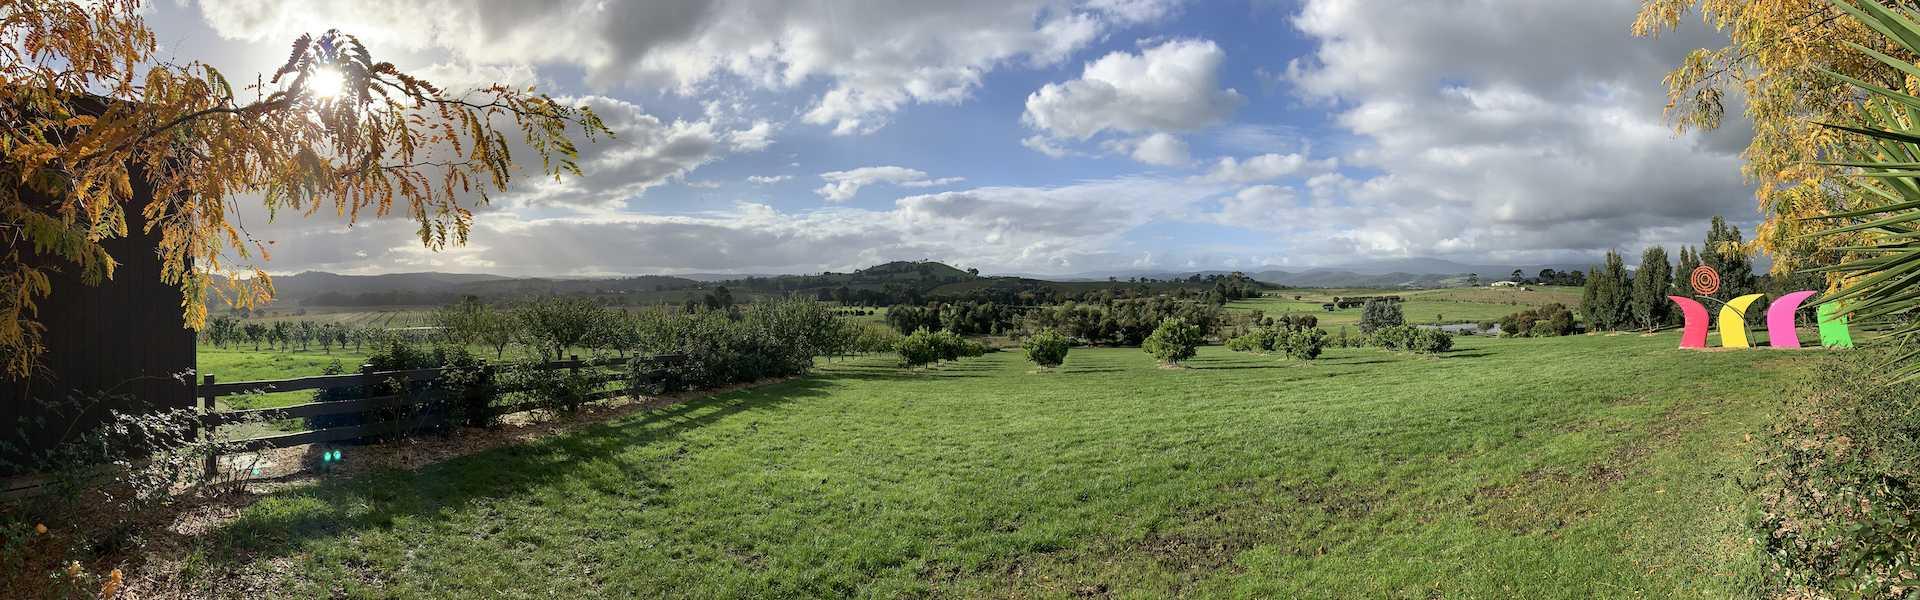 Kui Parks, Lilydale Pine Hill Caravan Park, Yarra Valley VIC